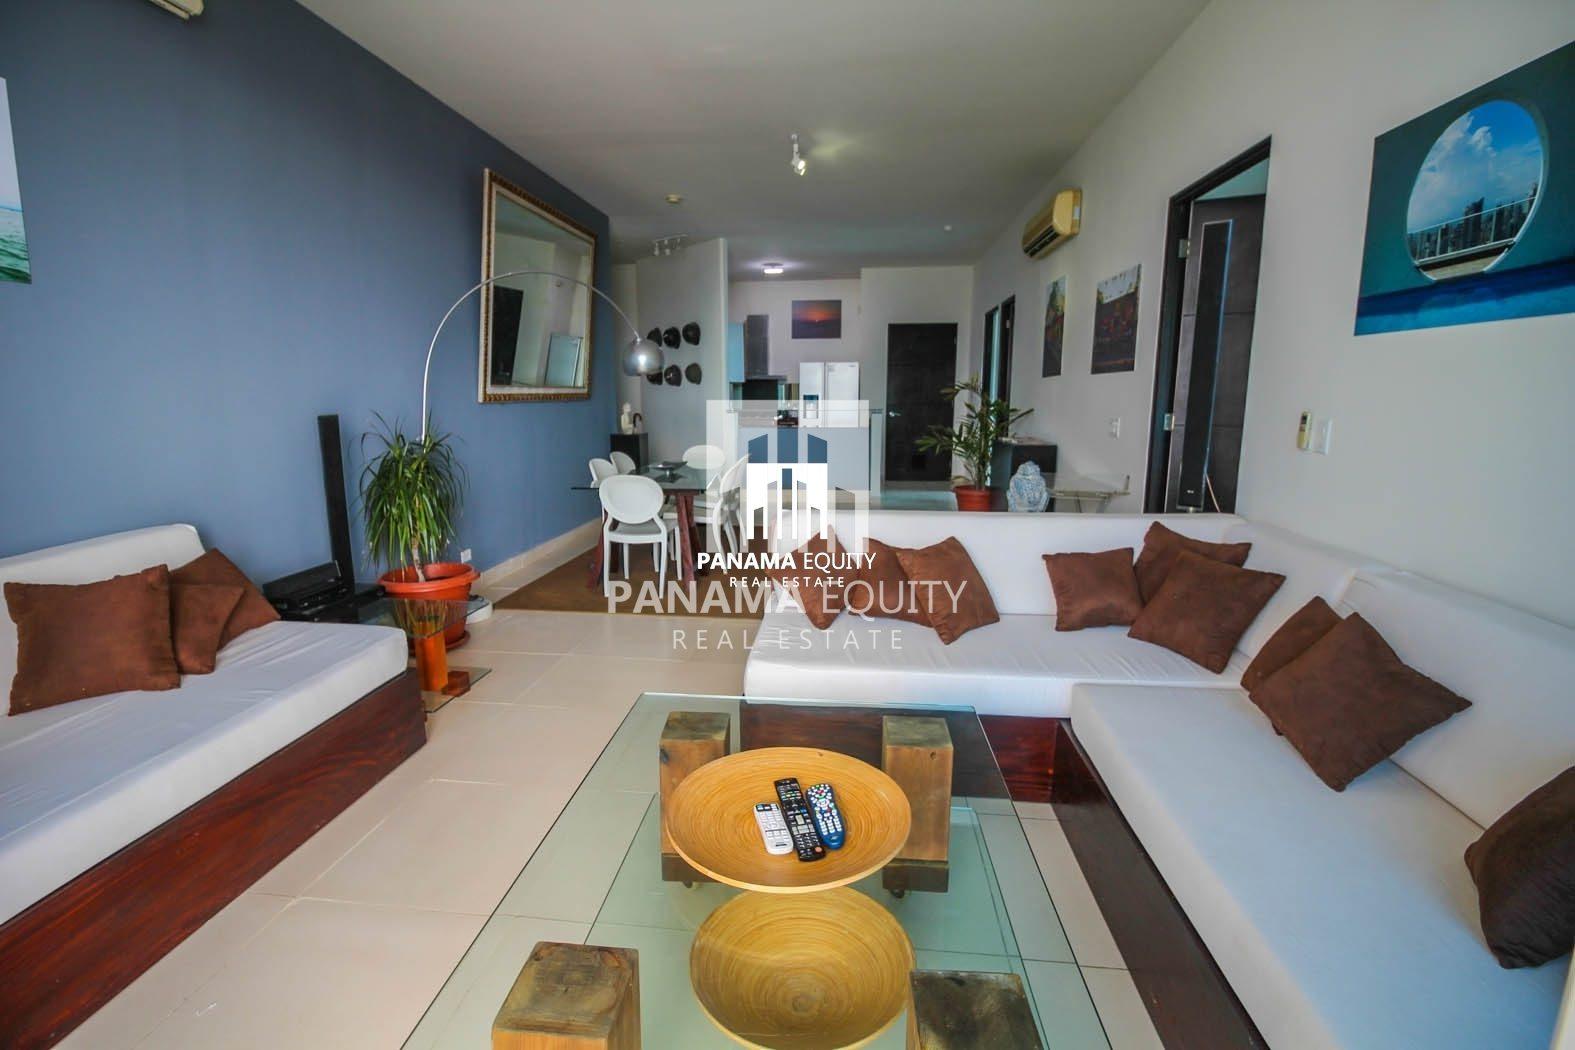 Lovely 2 bed property on Balboa Avenue